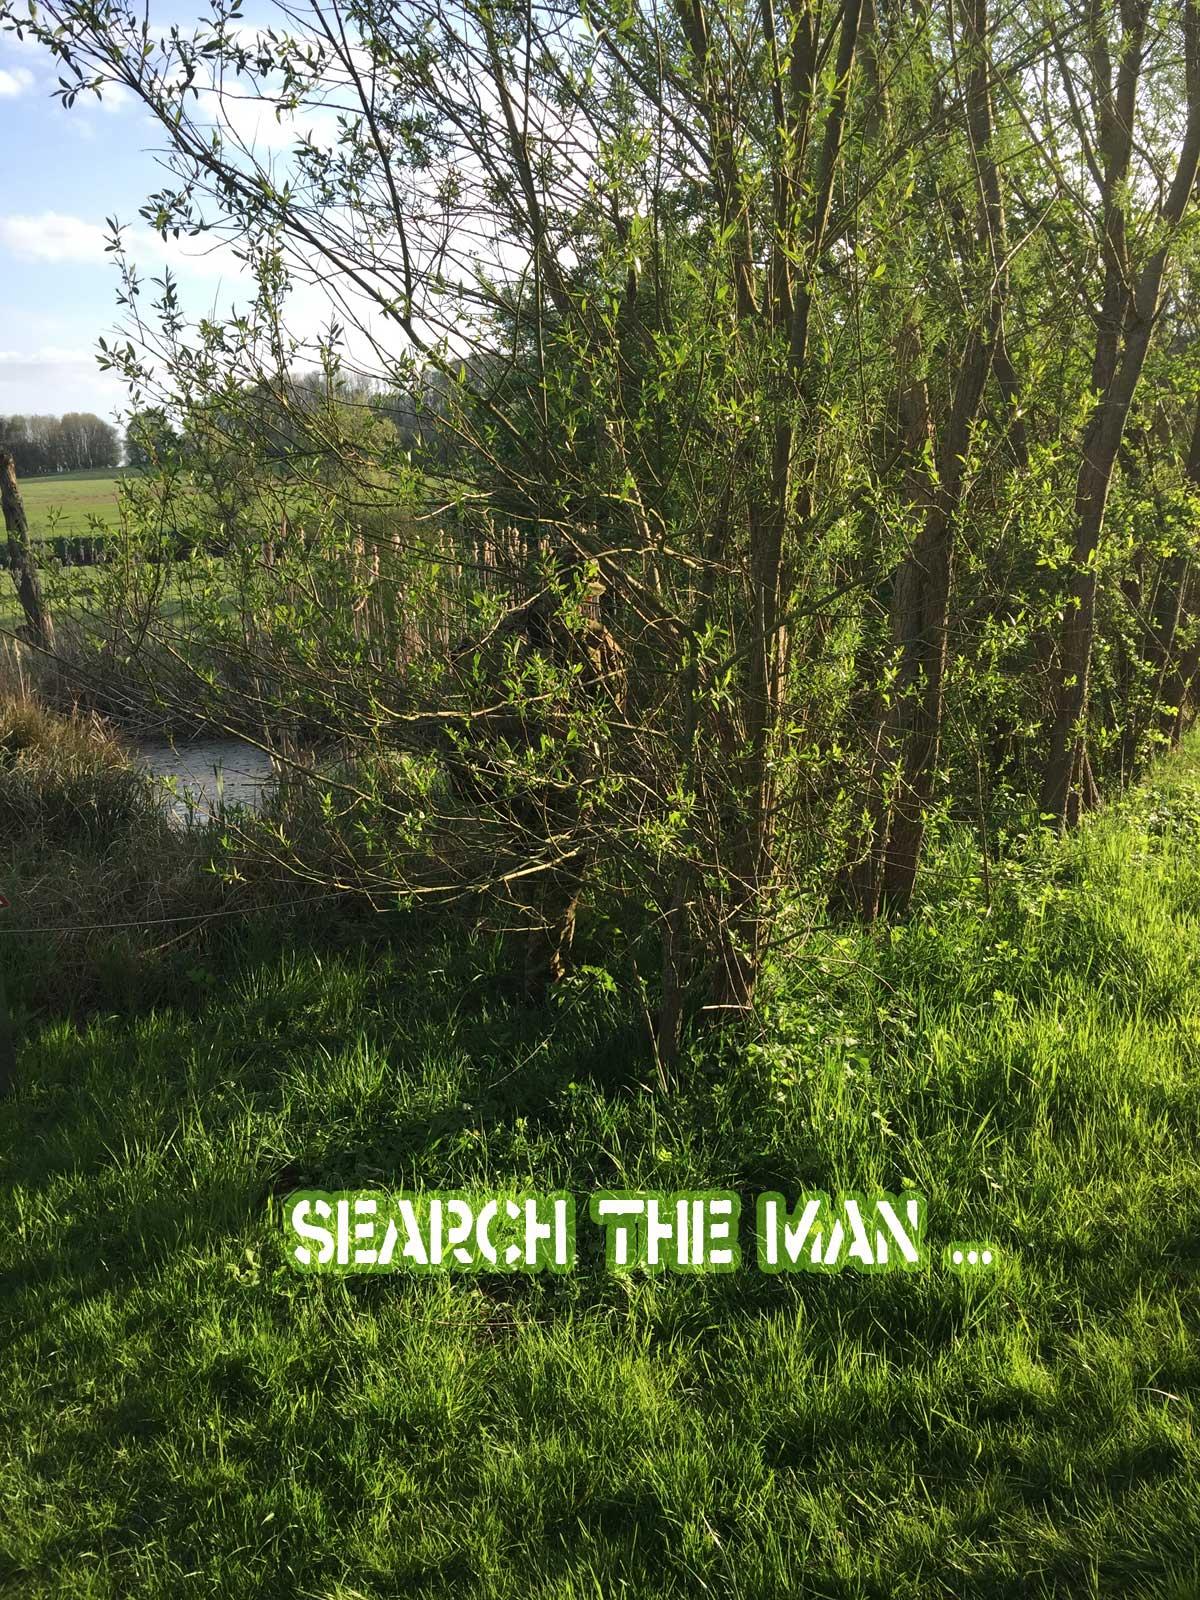 pencott greenzone, search the man